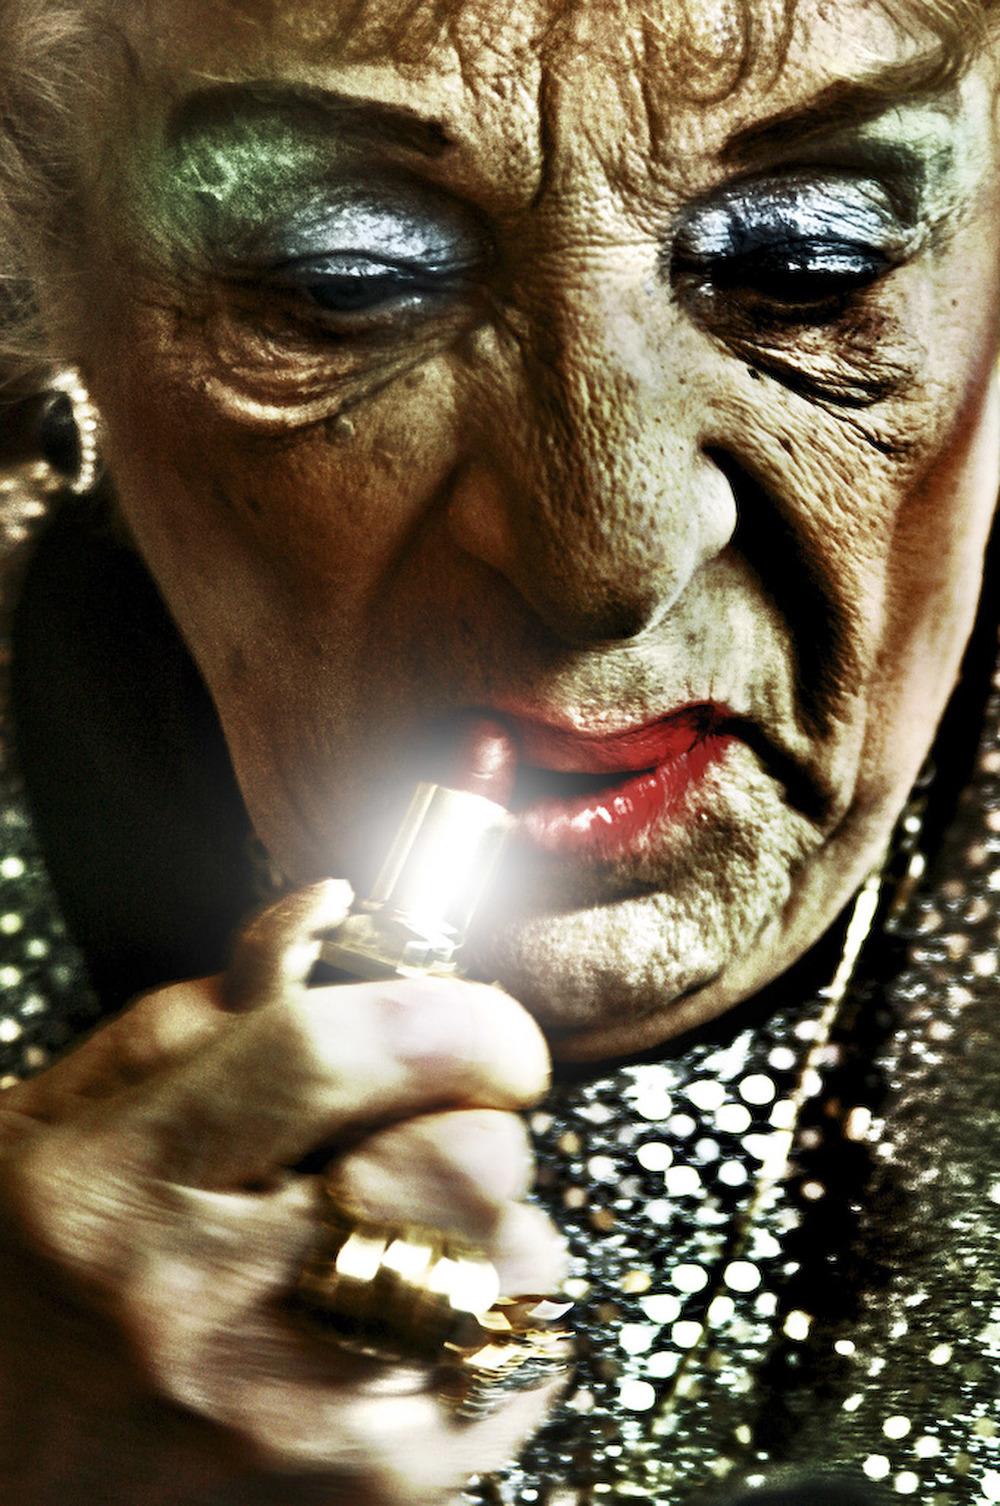 millie schmears her lipsstick.jpg